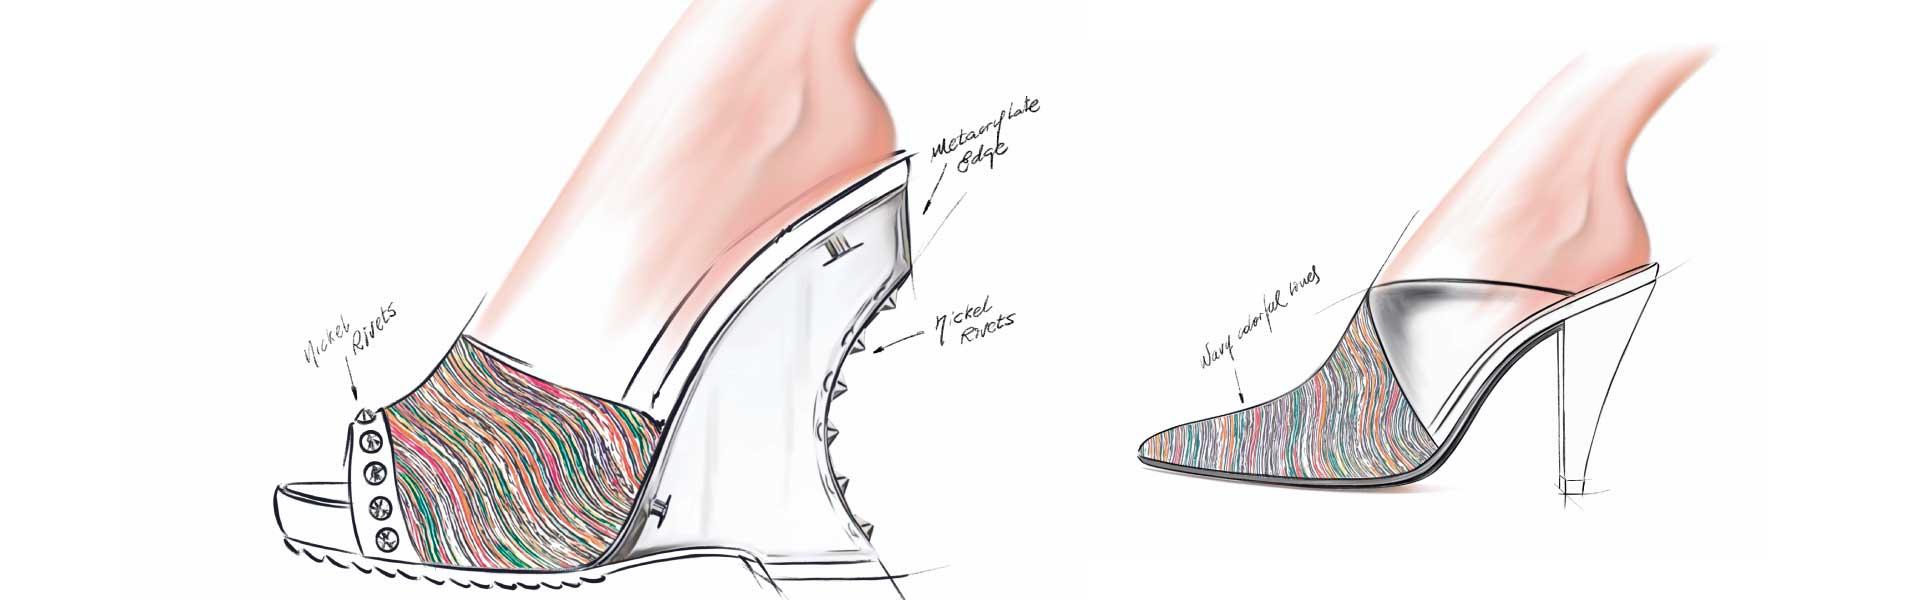 Sketchs footwear trends women SS20 Wavyful